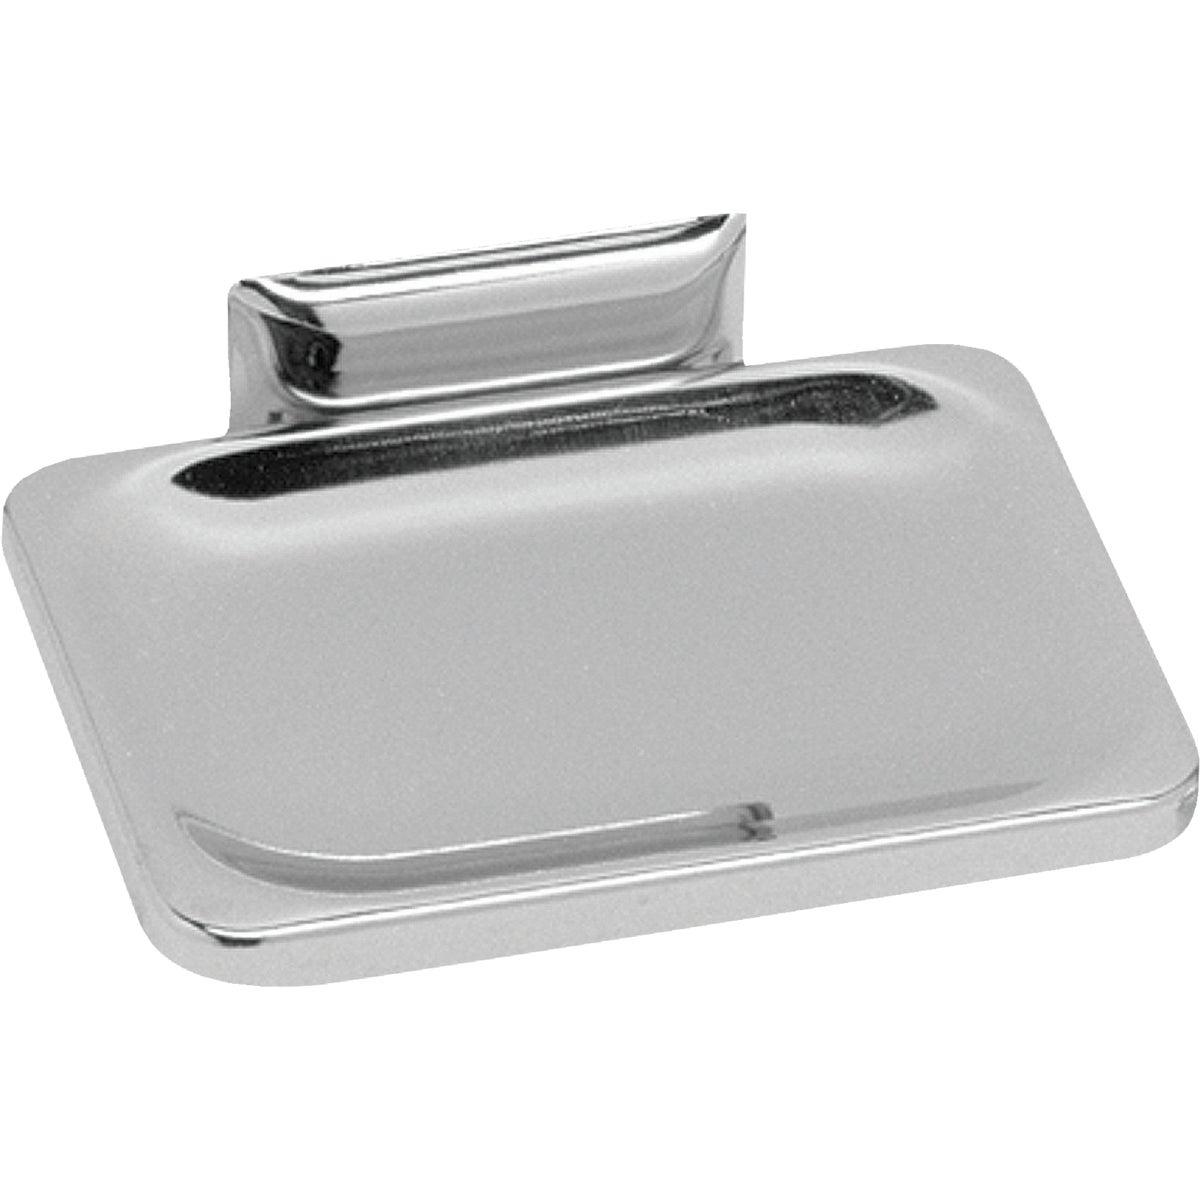 CHR WALL MOUNT SOAP DISH